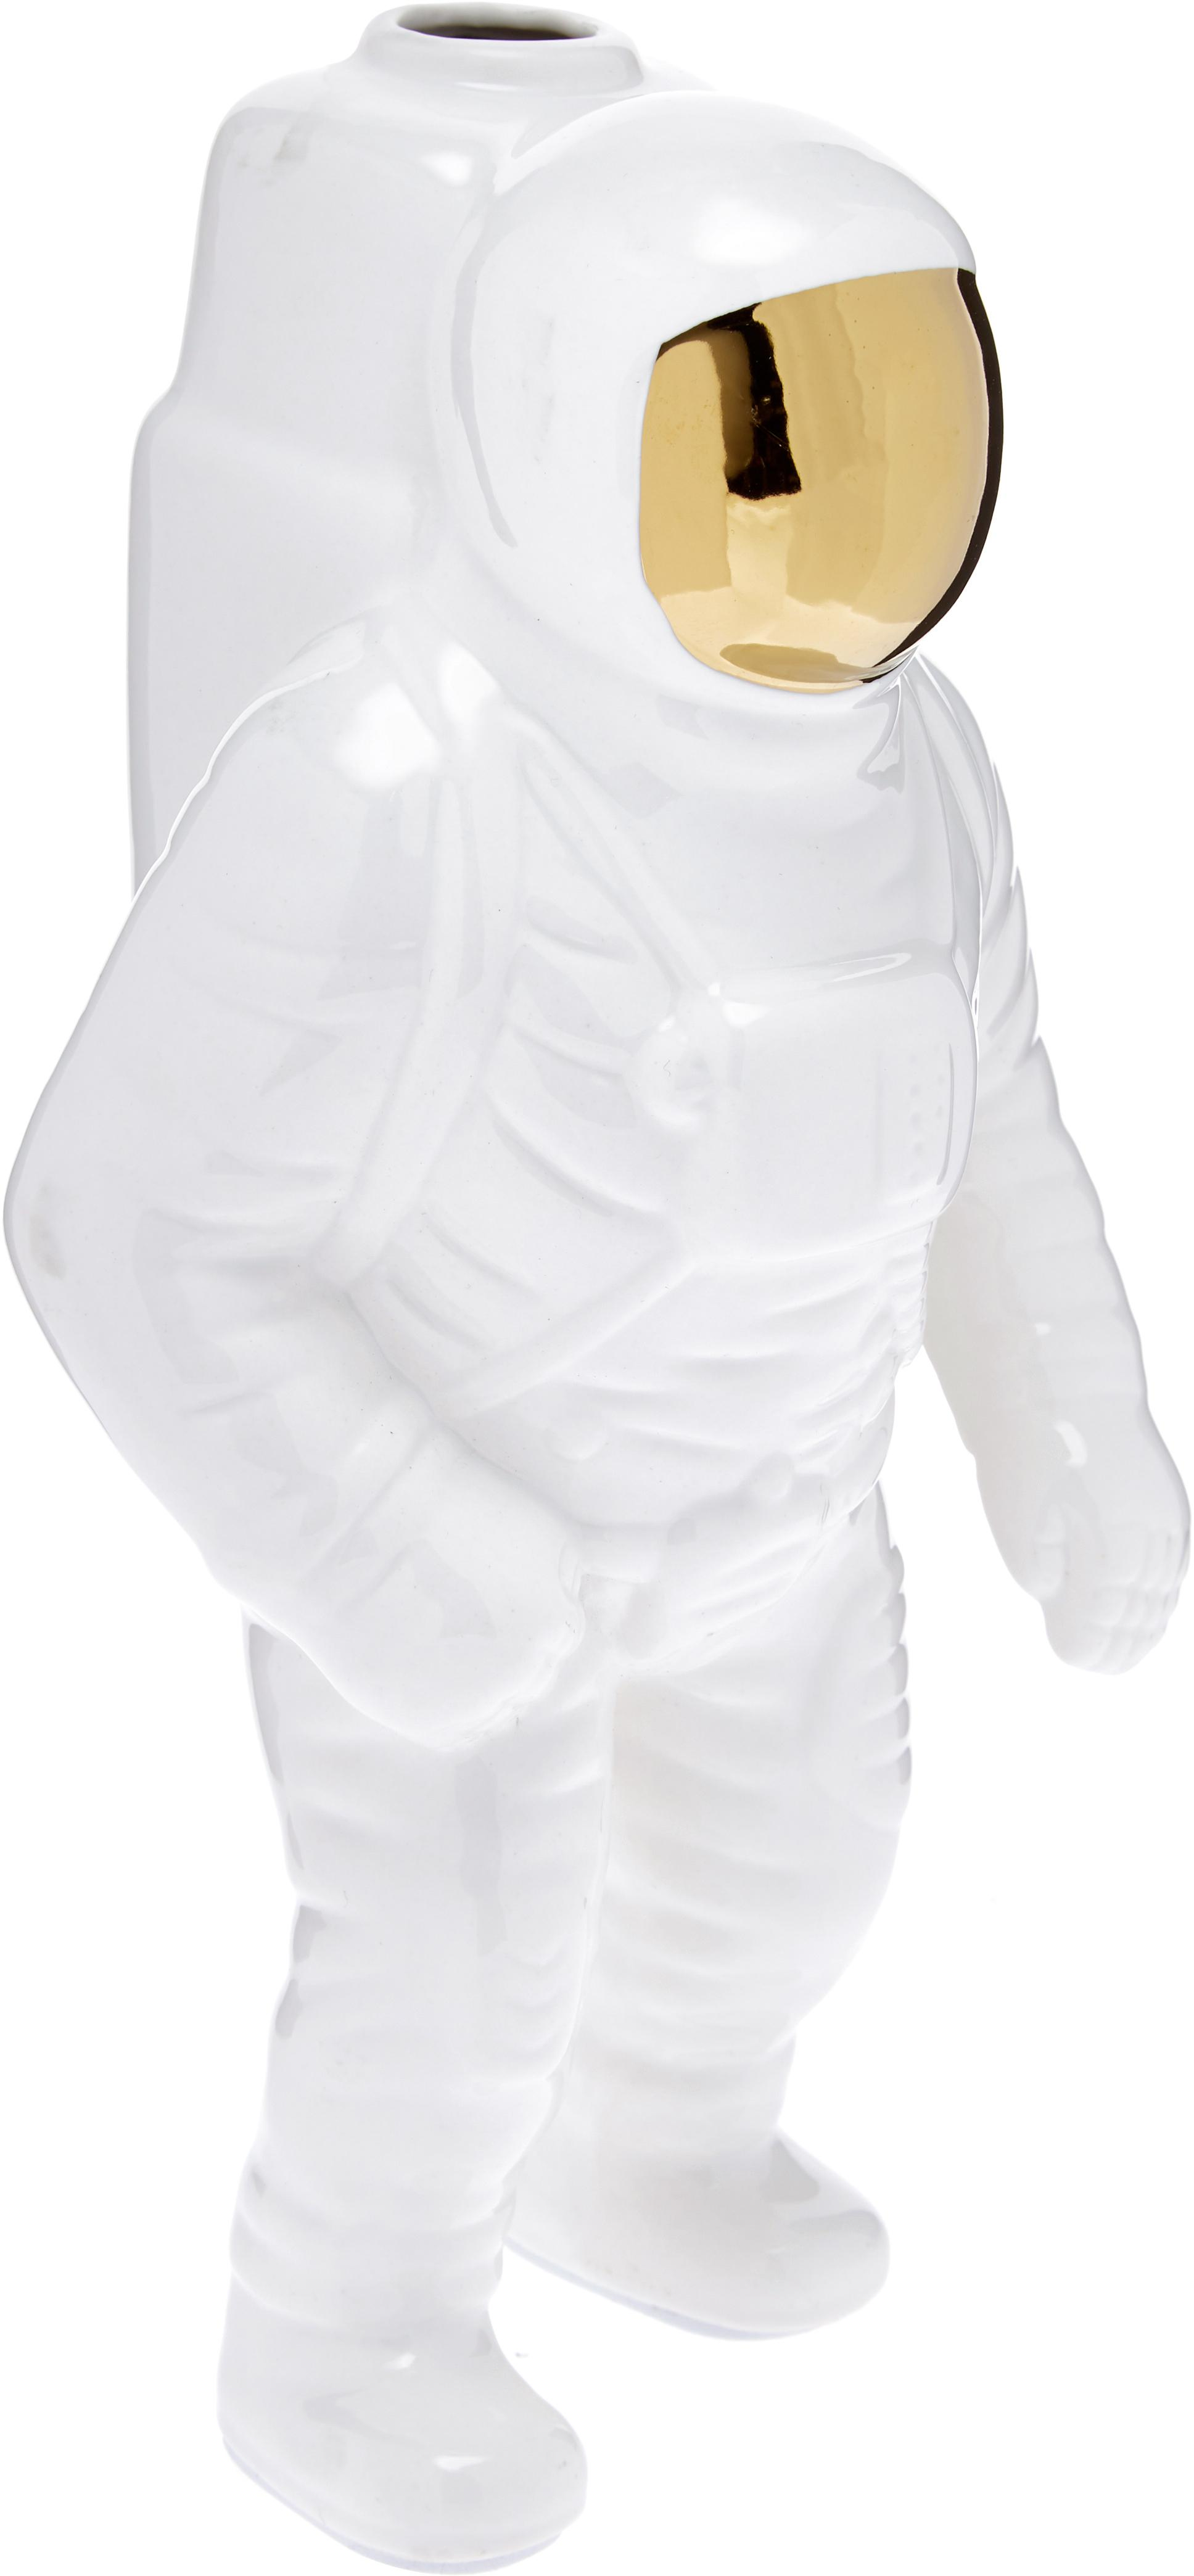 Decoratieve vaas Cosmic Diner Starman, Porselein, Wit, goudkleurig, H 28 cm